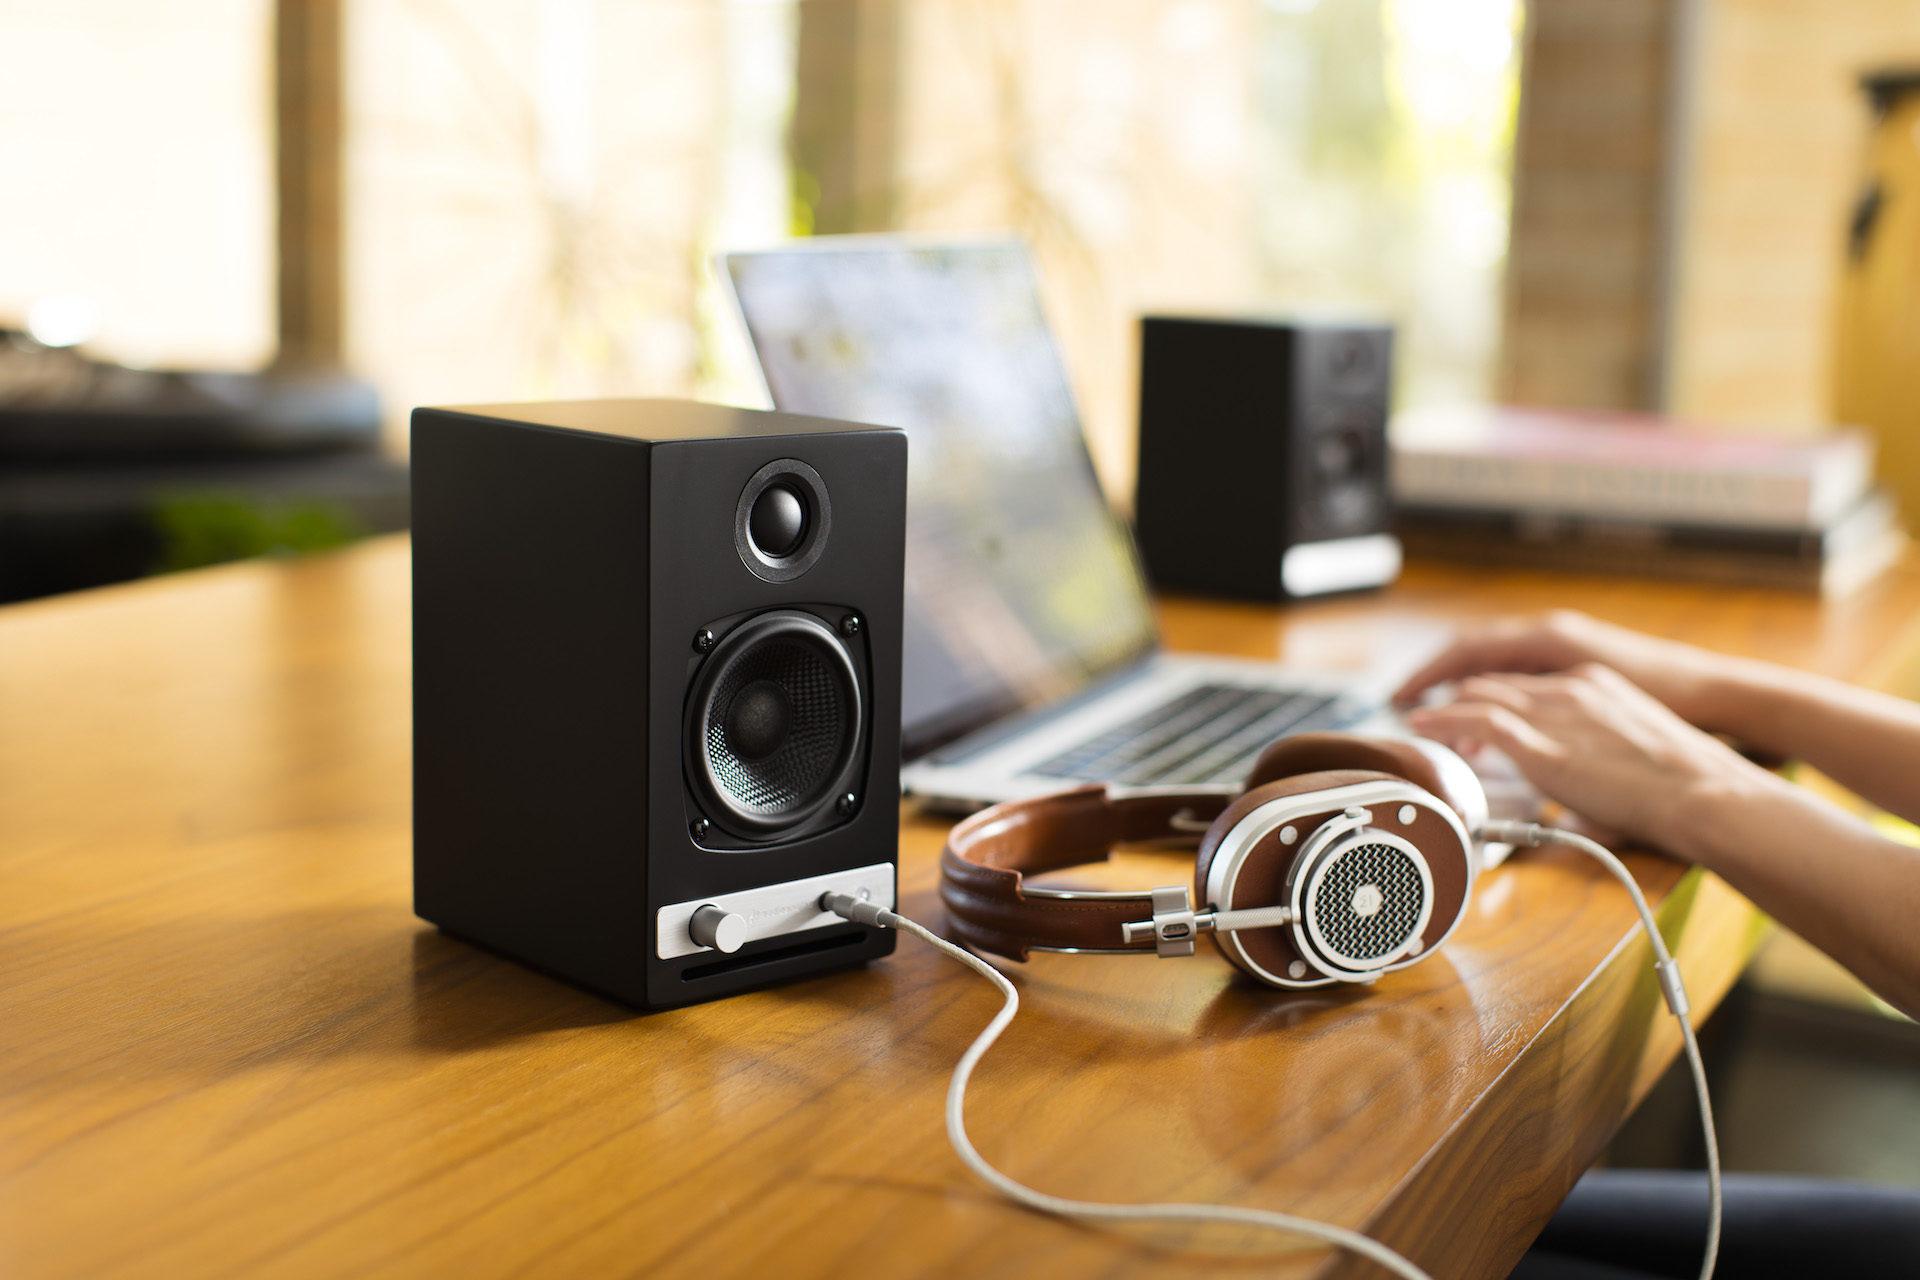 hd3-lifestyle-headphones-no-grill-1920x1280